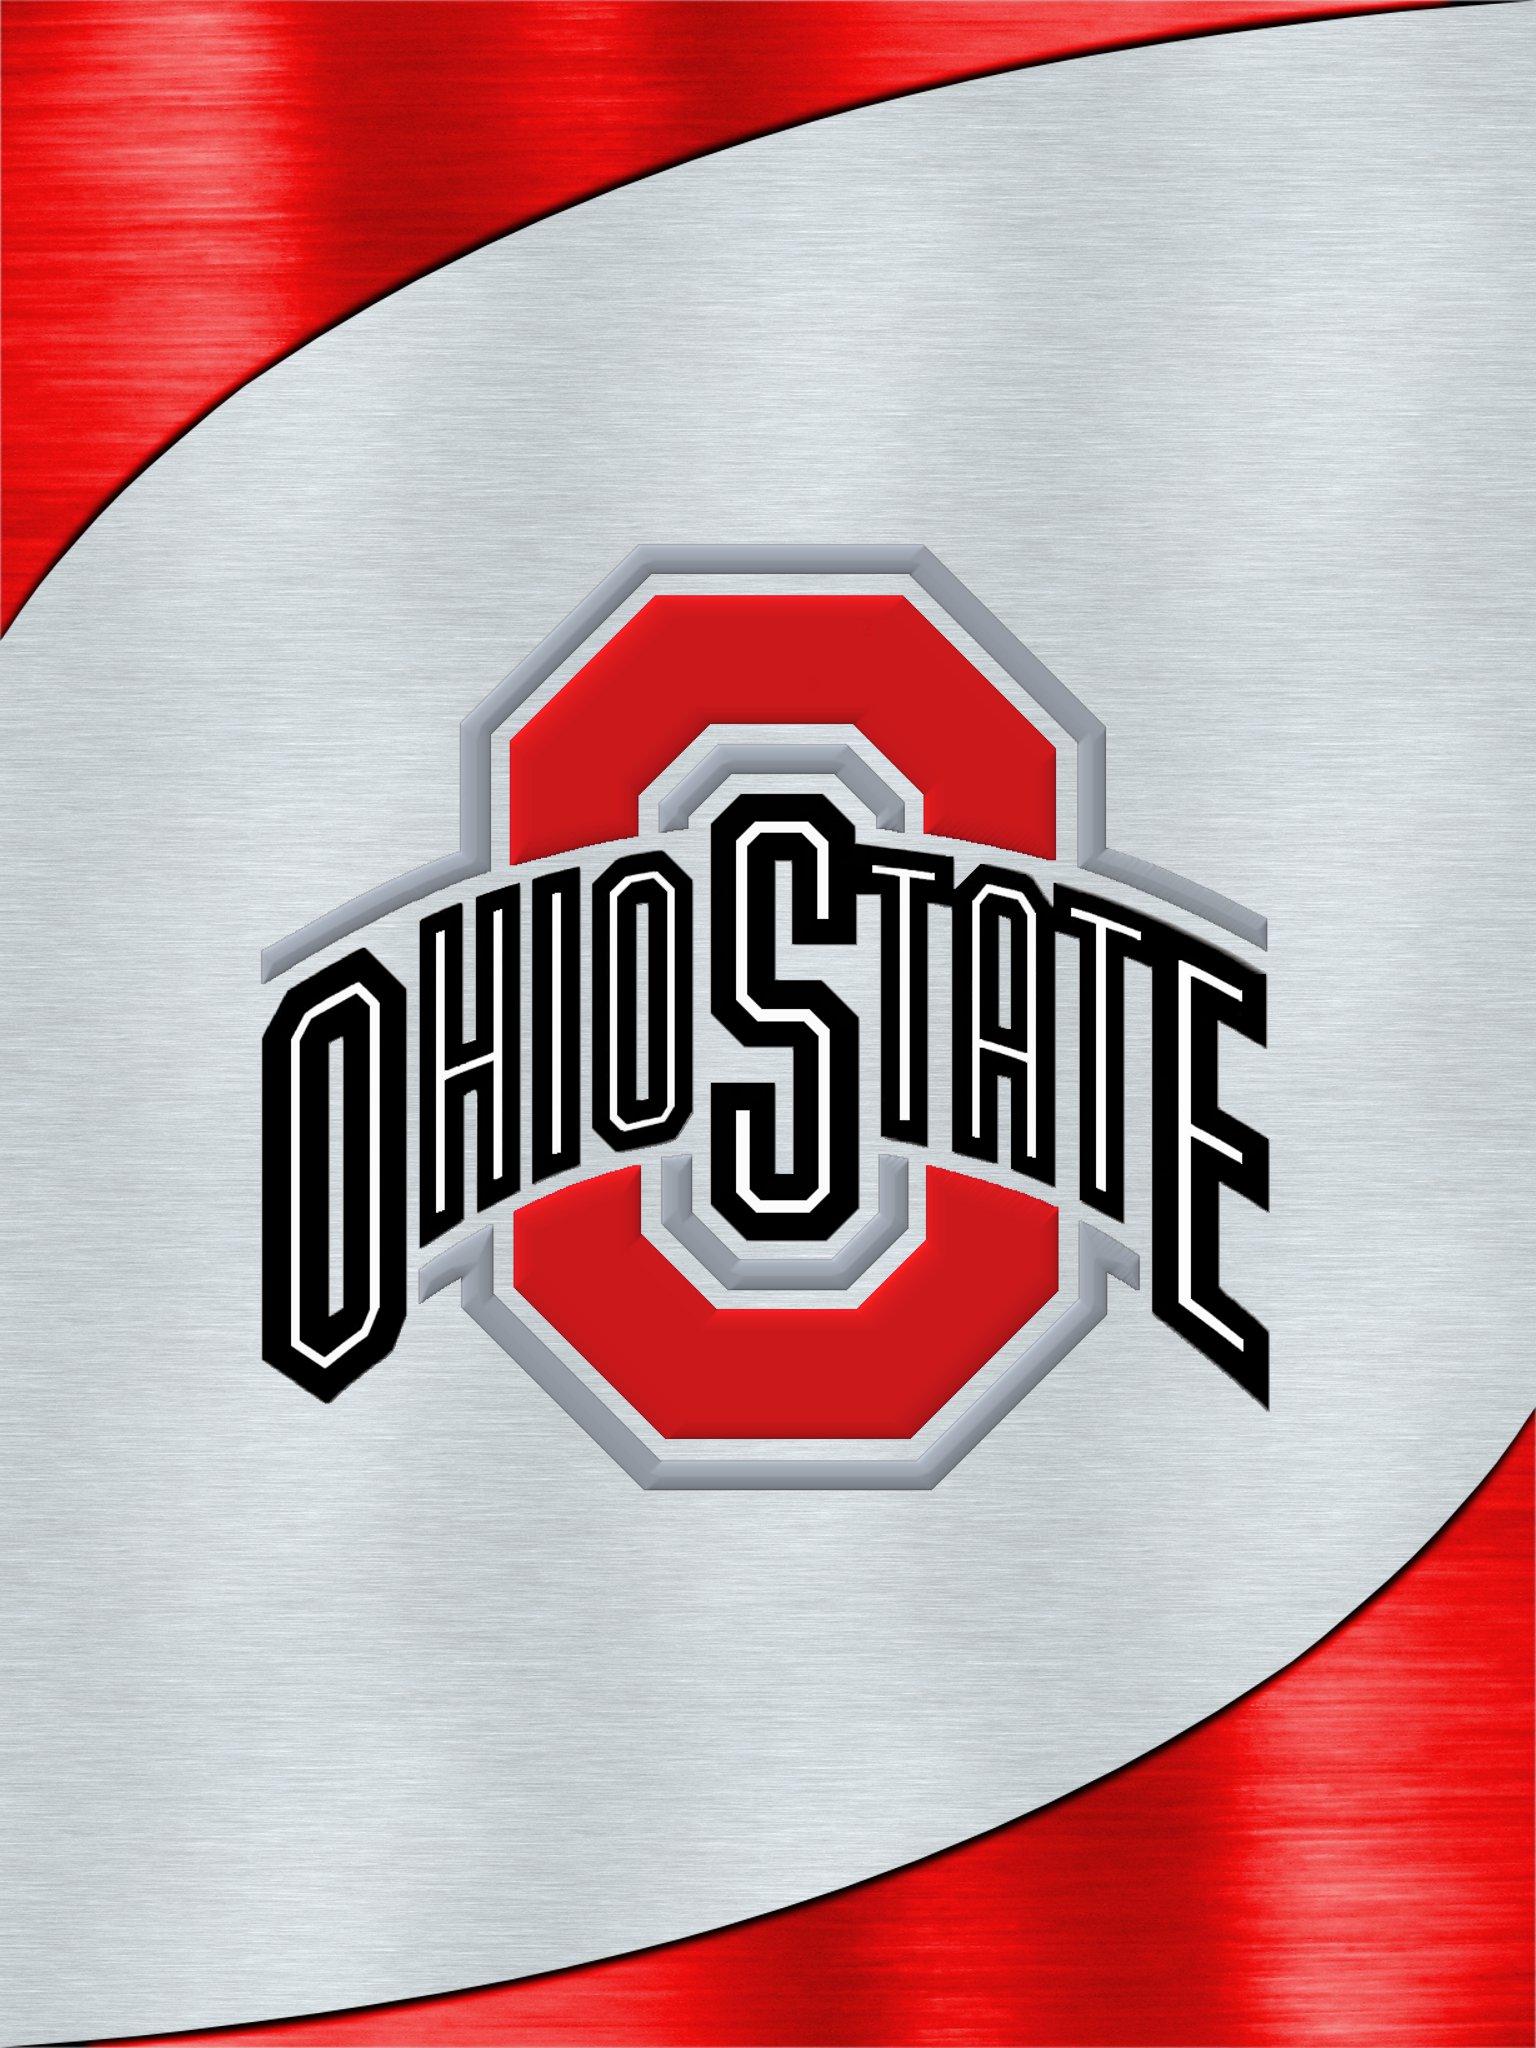 OSU ipad 2 Wallpaper 01 - Ohio State